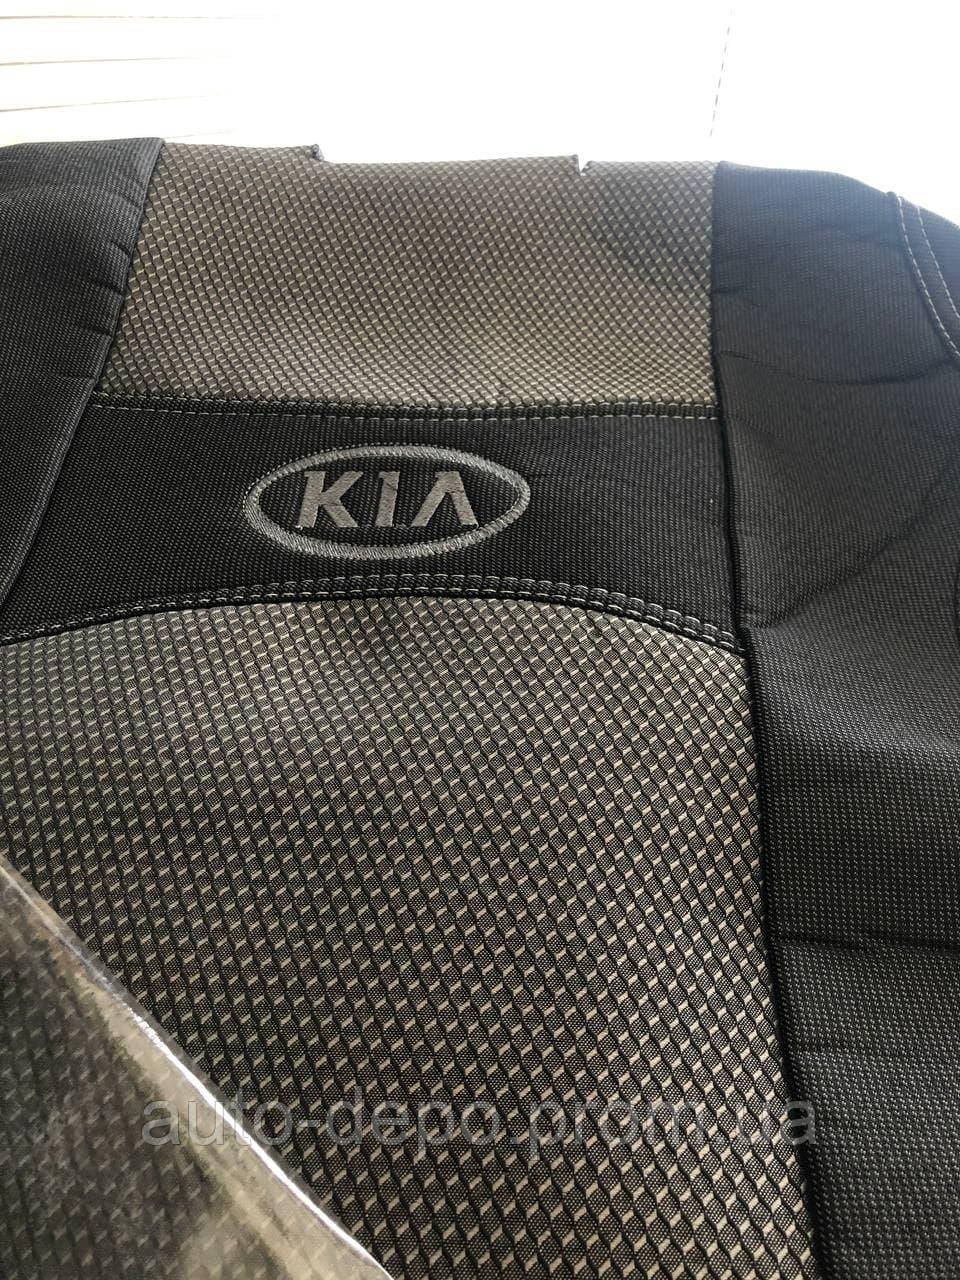 Чехлы для автомобиля Киа, Kia